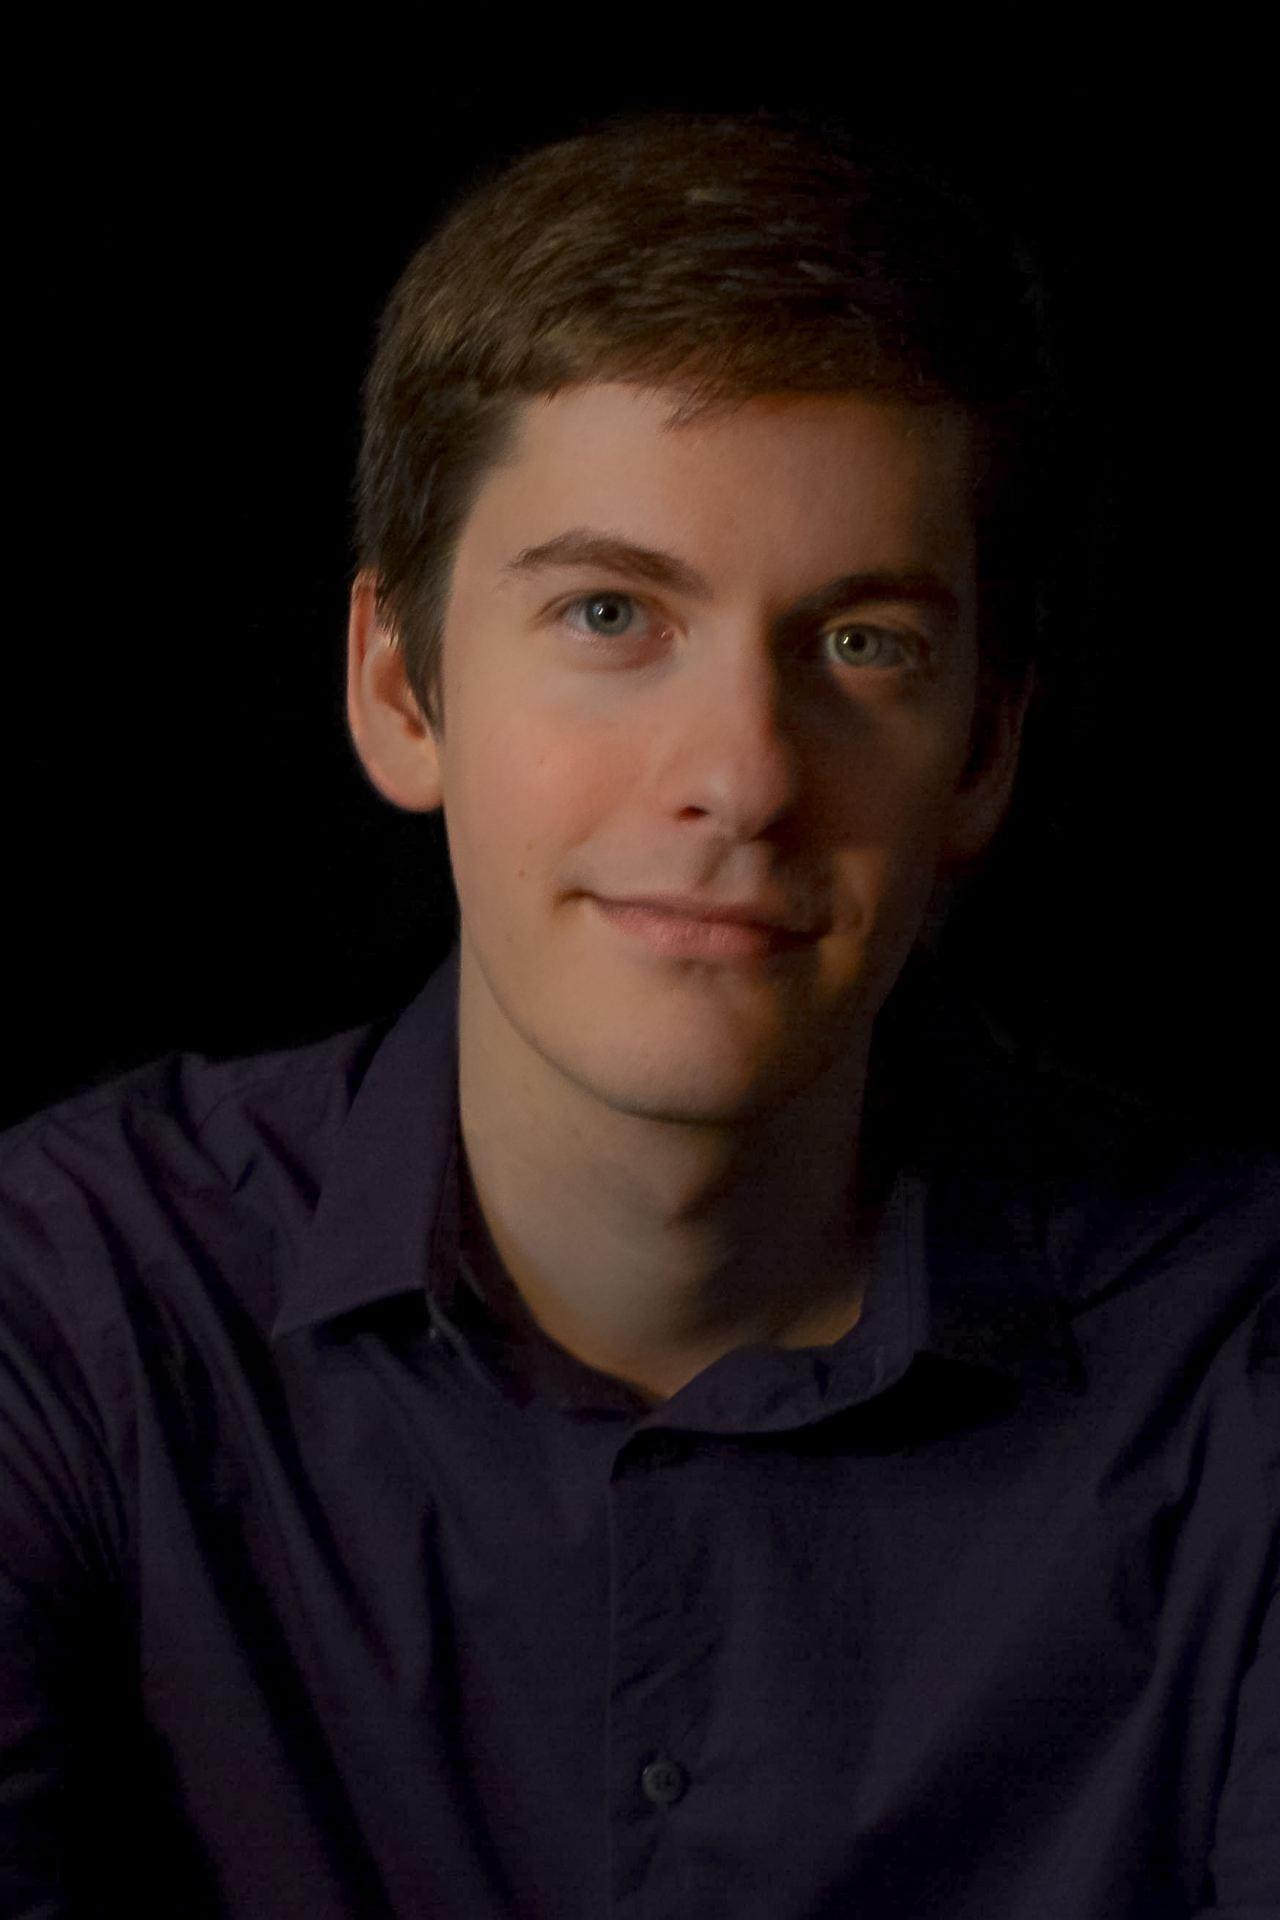 Headshot of graduate student John Vinzant